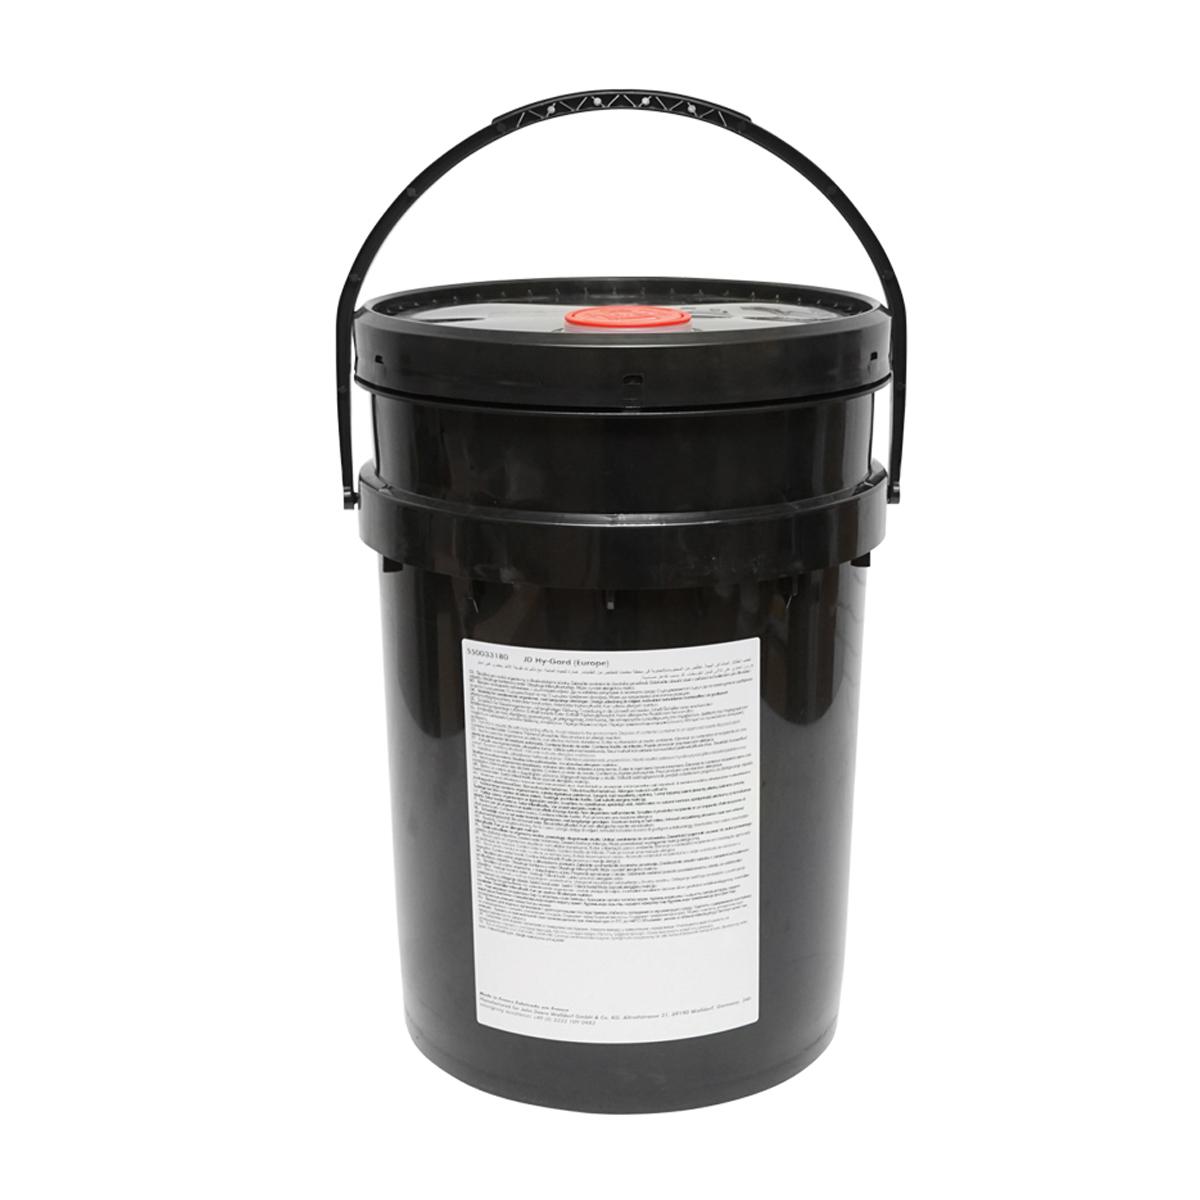 Ulei HY GARD John Deere transmisie/hidraulic 20L